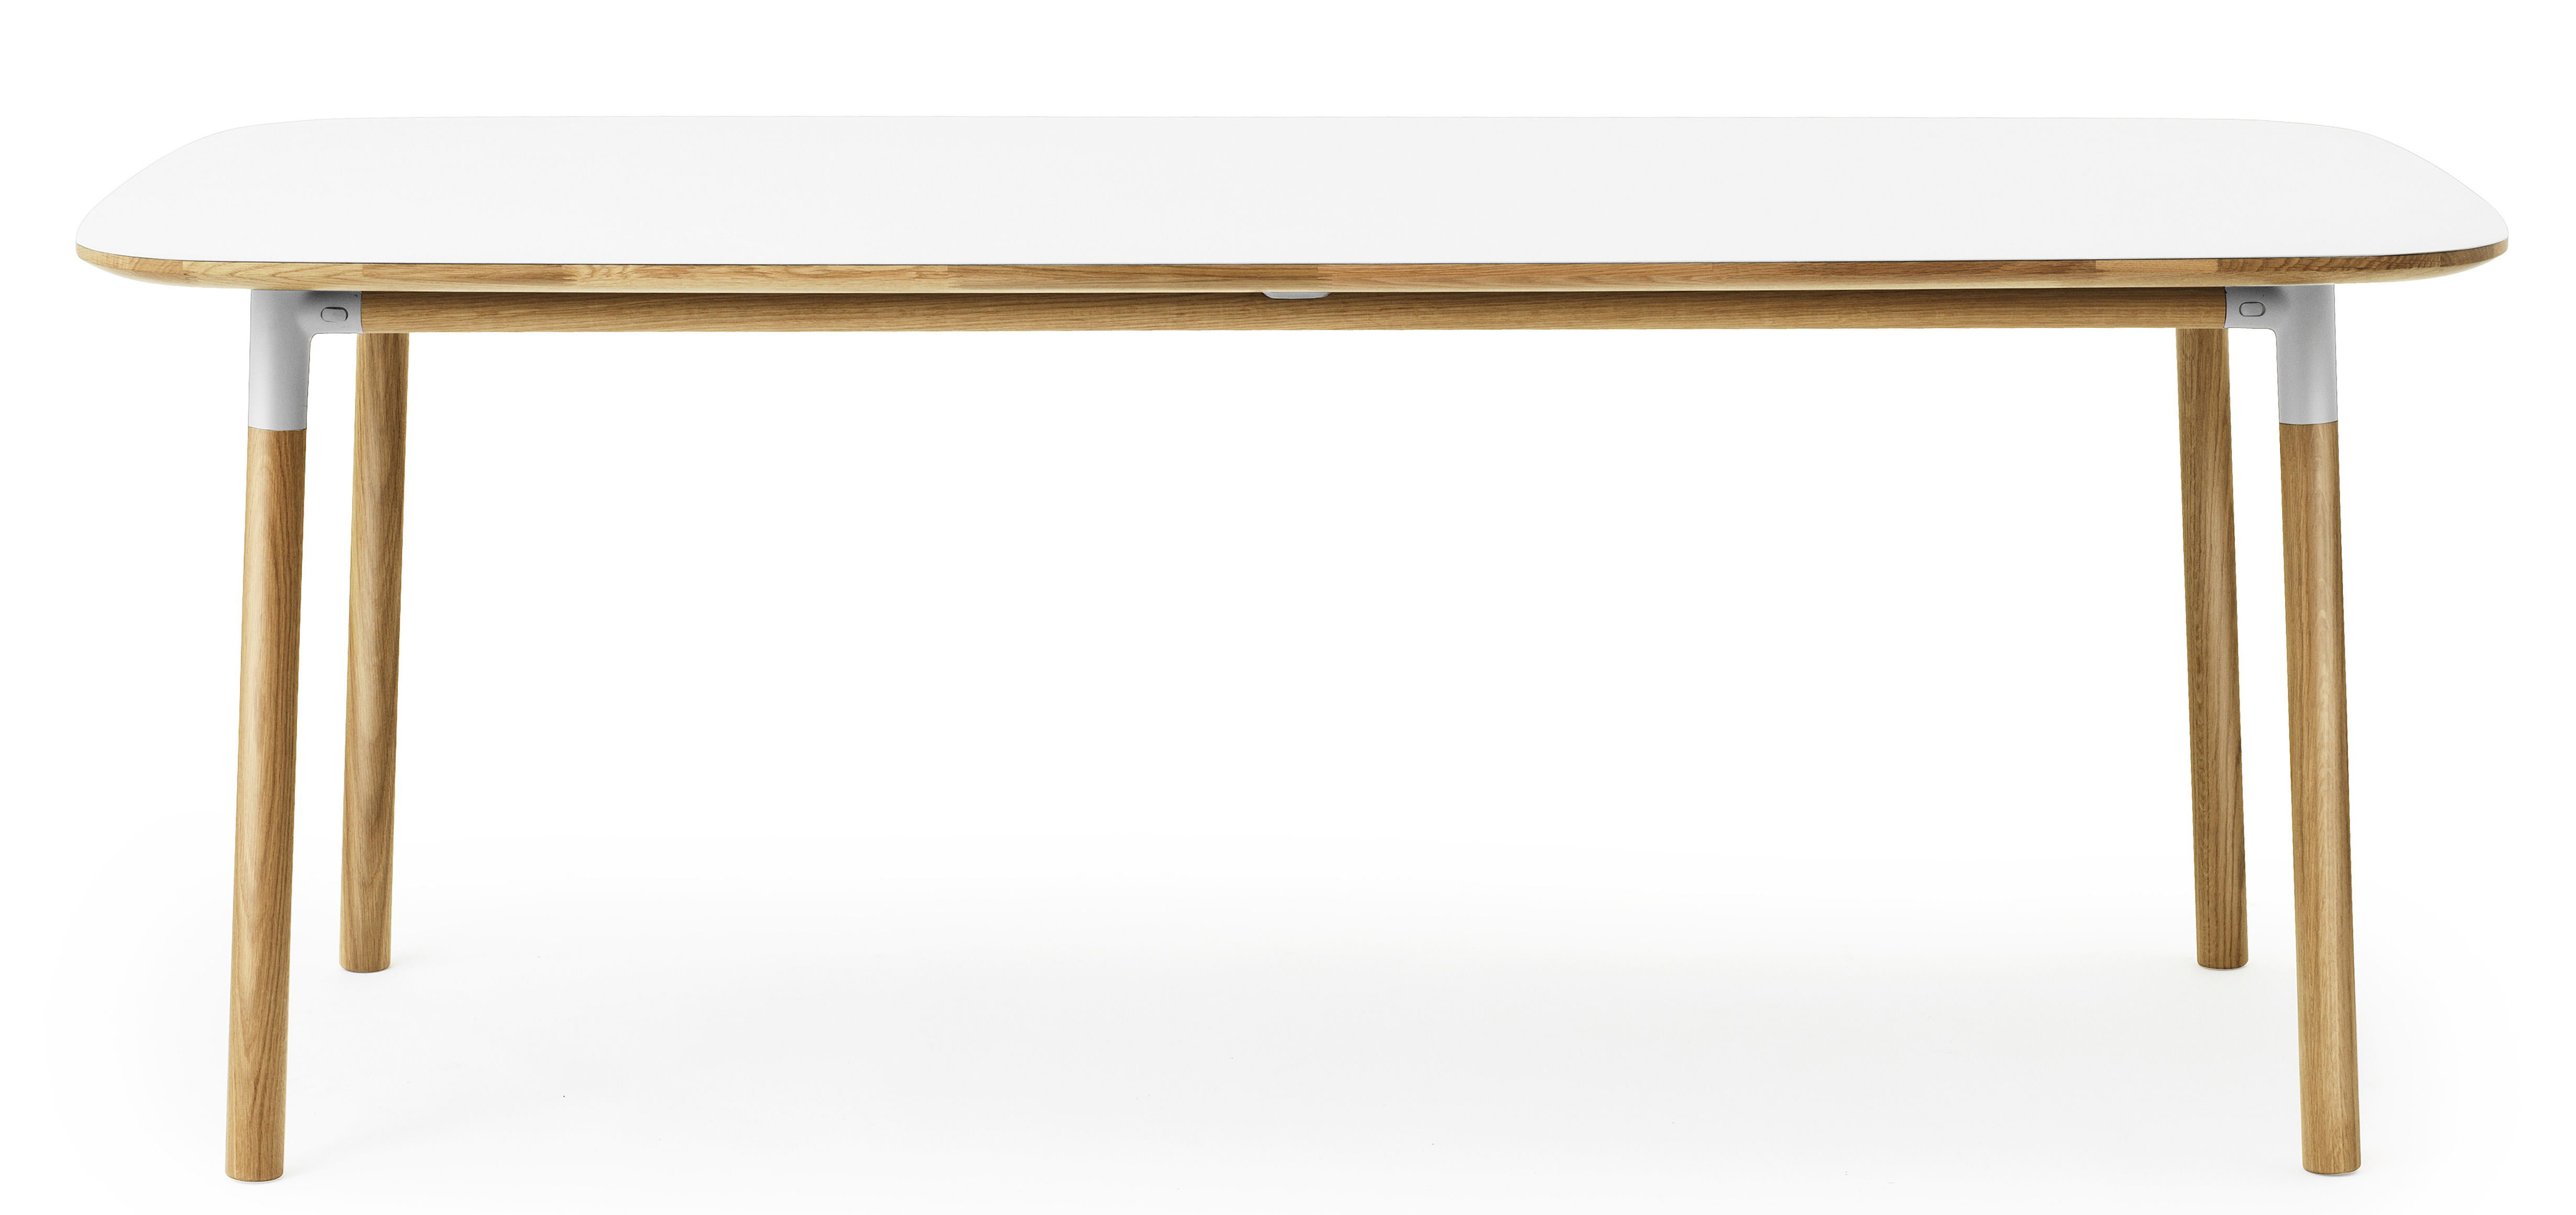 Form table 95 x 200 cm white oak by normann copenhagen for Html form table